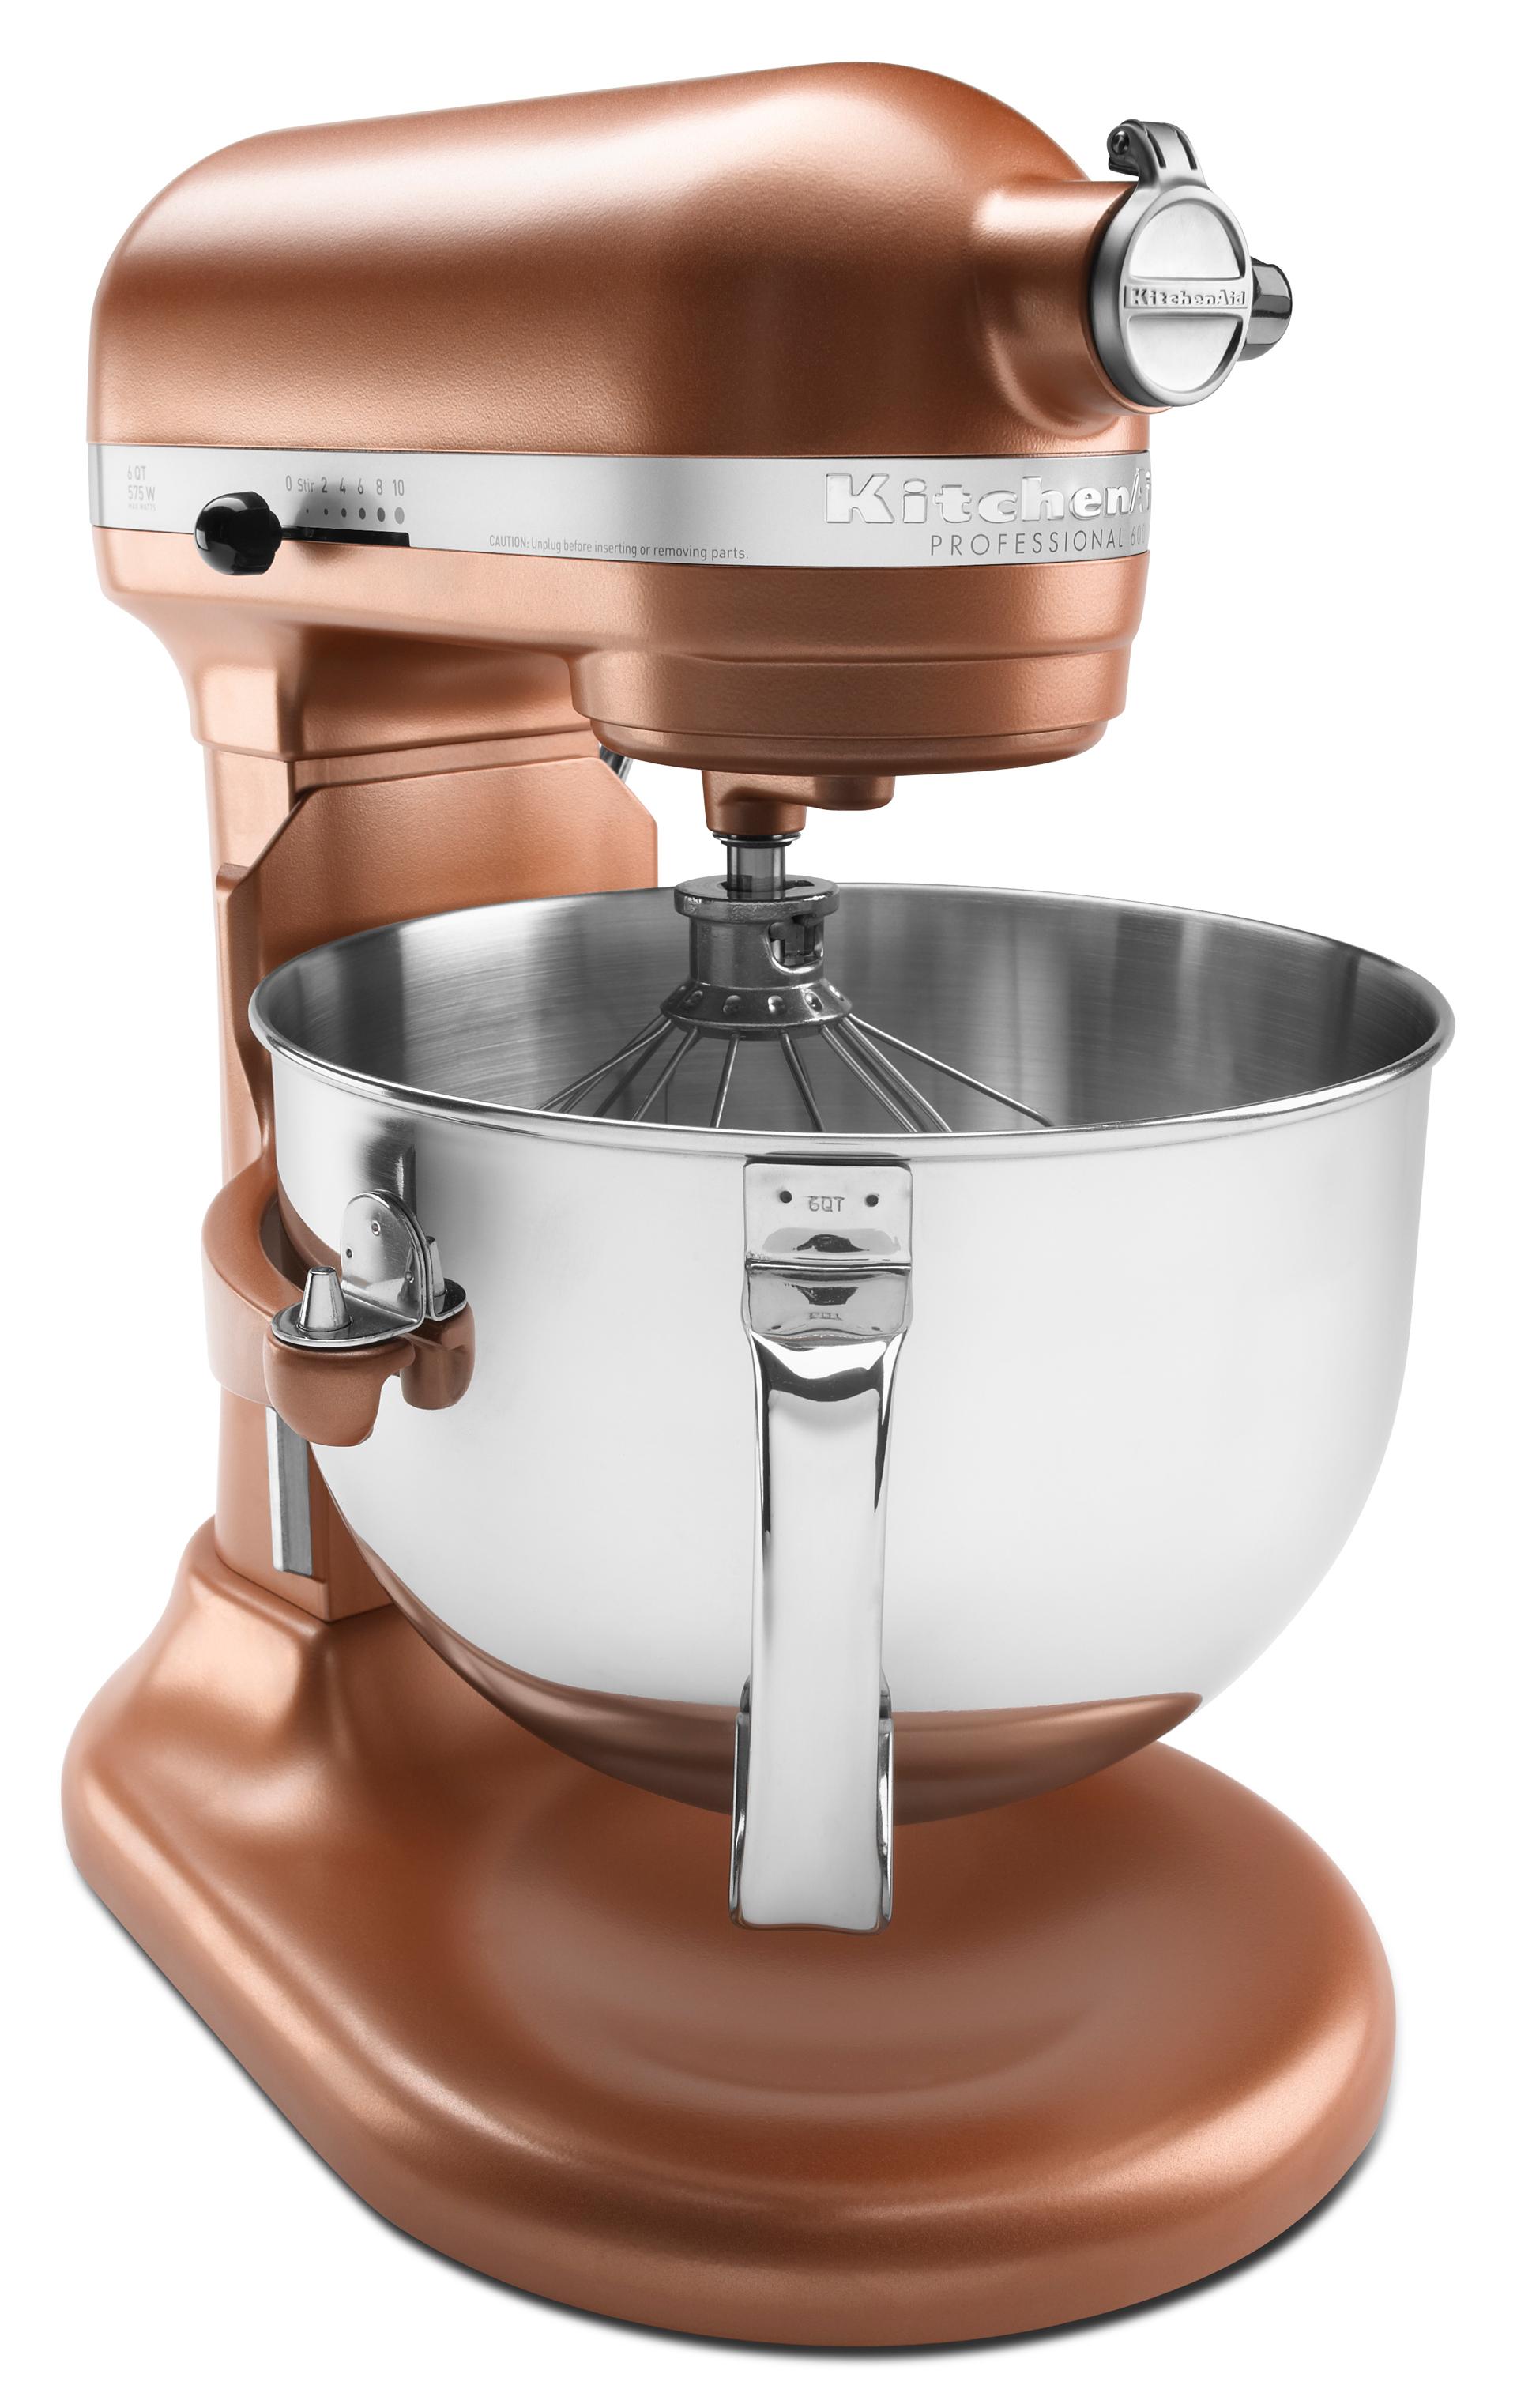 Green kitchenaid stand mixer -  Kitchenaid Stand Mixer Green 41 Download